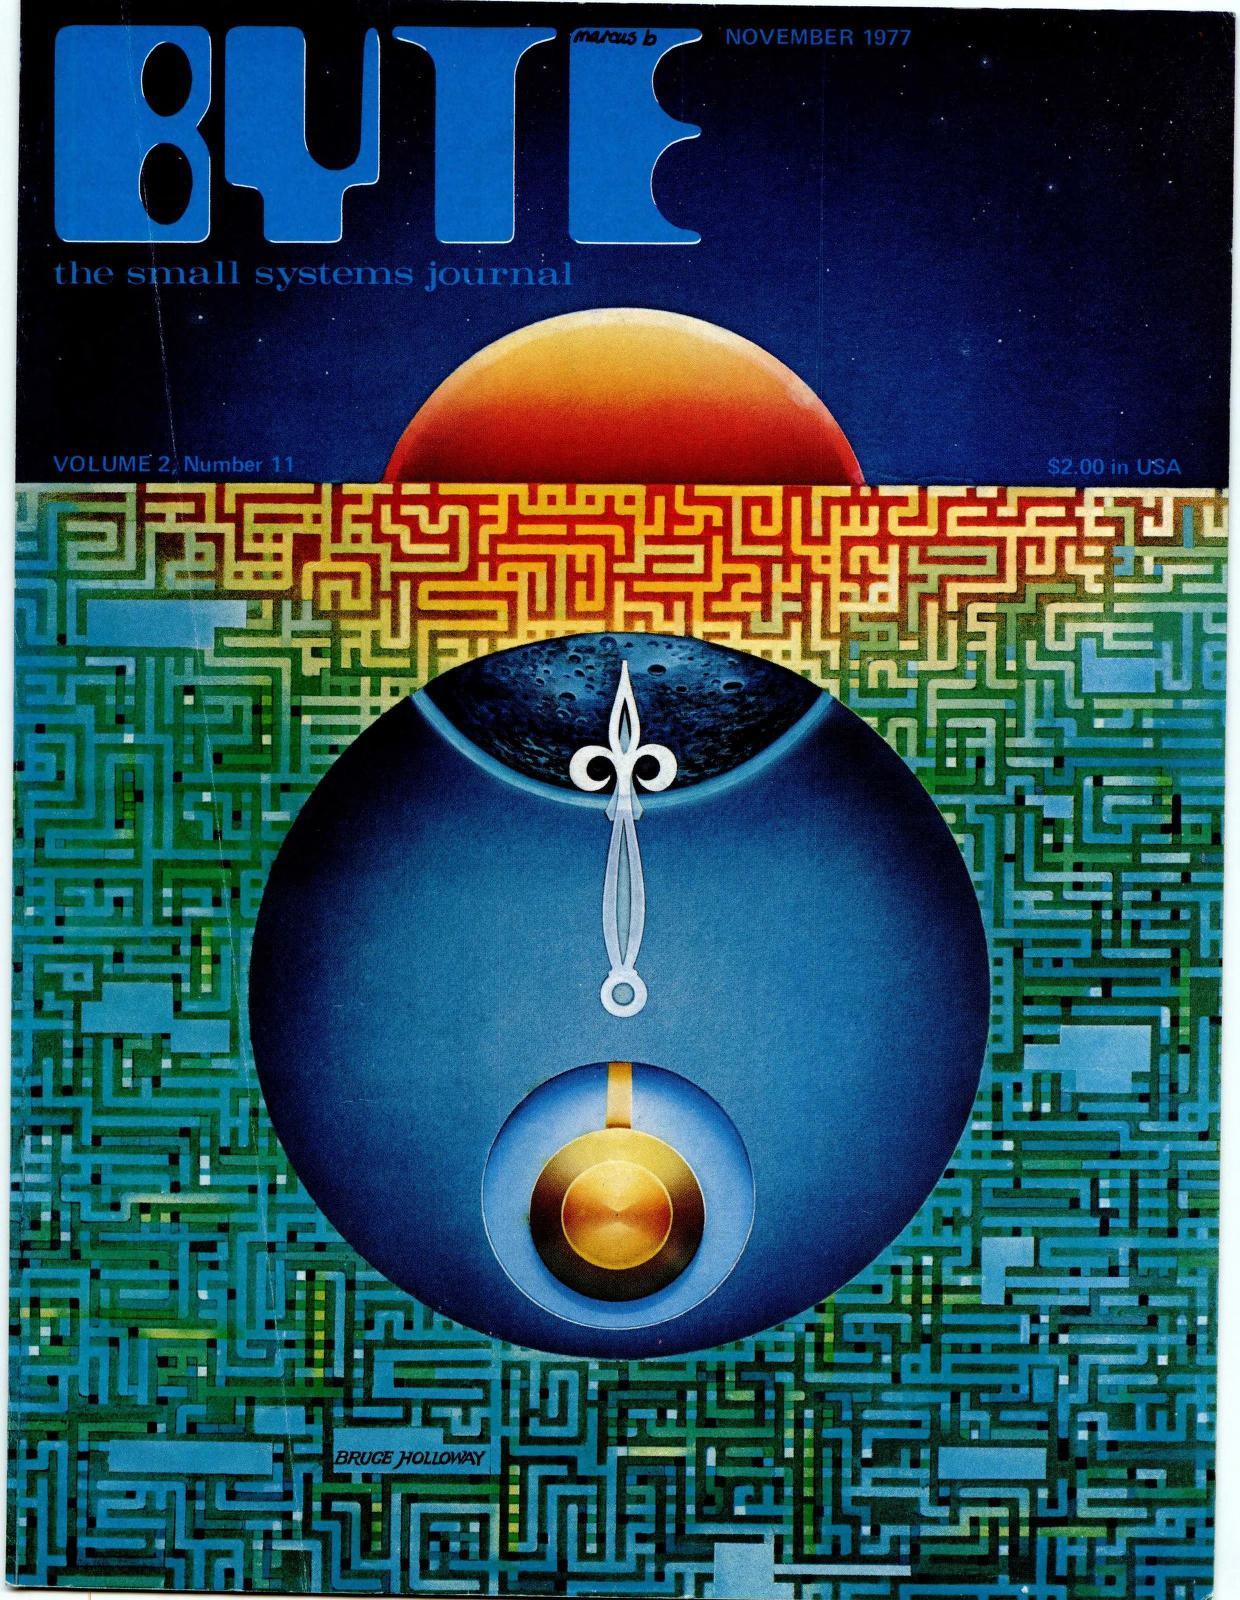 November 1977. Malt av Bruce Holloway. Temaet for dette nummeret er minne, men det inkluderer blant annet en artikkel ved navn Simulation of Motion: An improved Lunar Lander Algorithm. Spillstoff fra 70-tallet er ikke helt som spillstoff i dag.